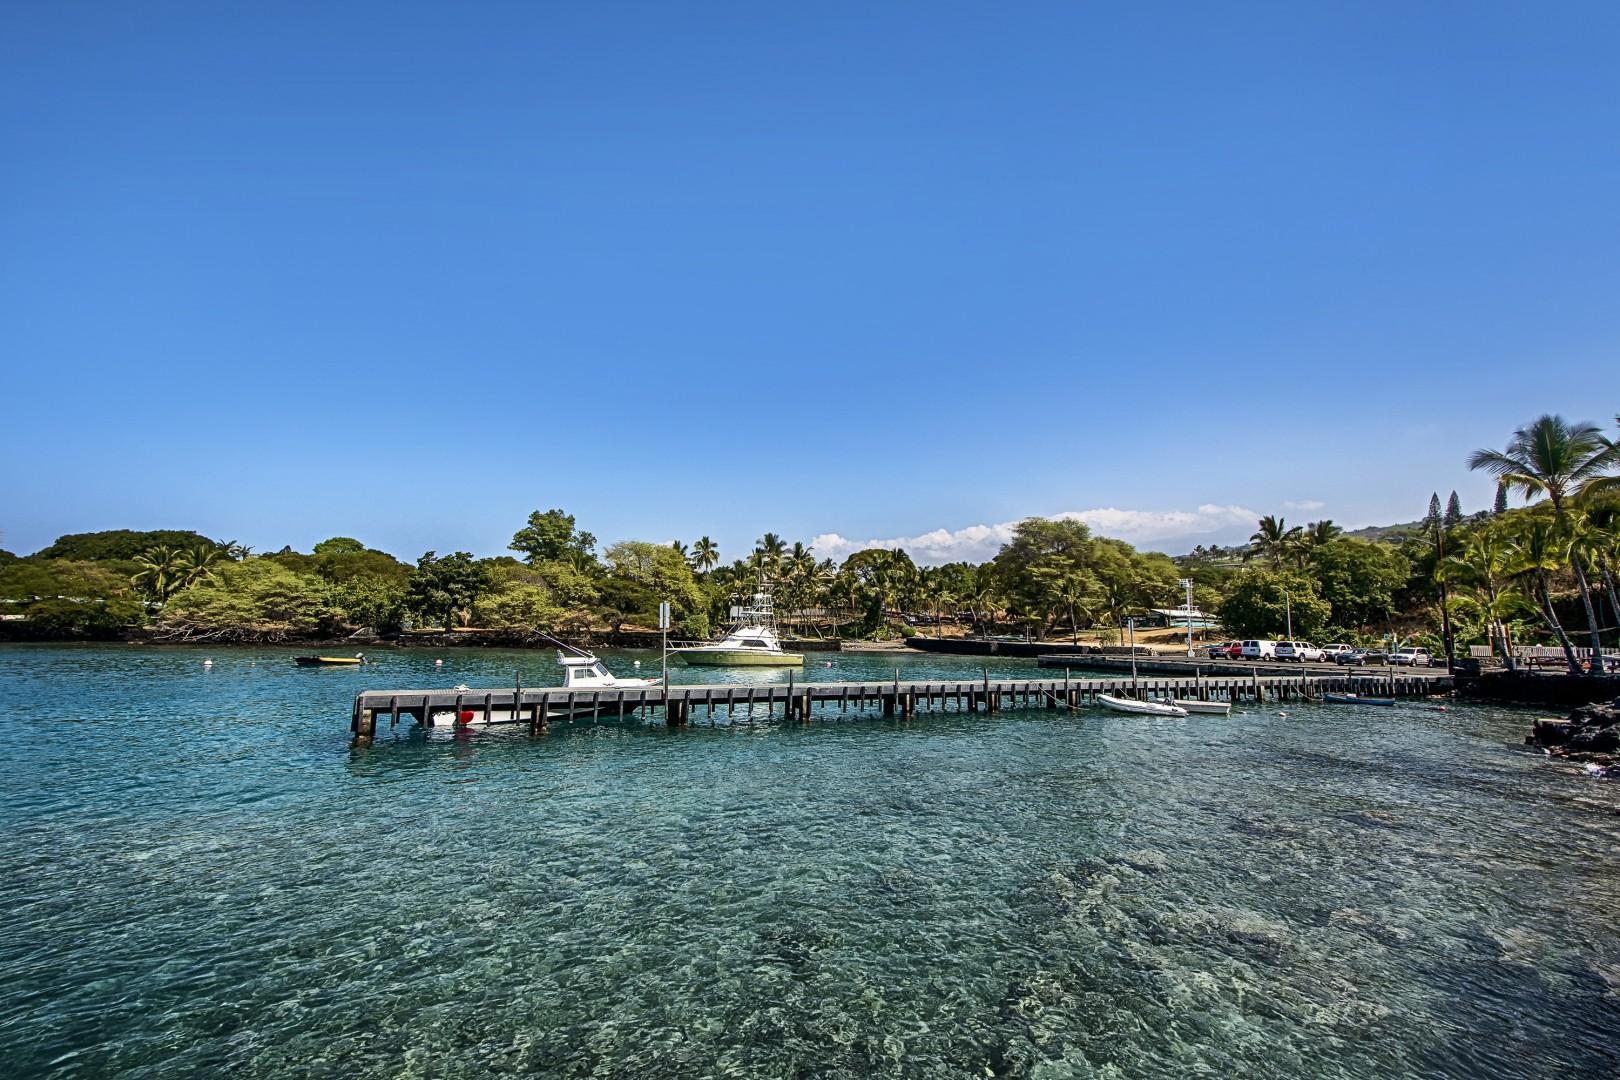 Nearby Keauhou Harbor